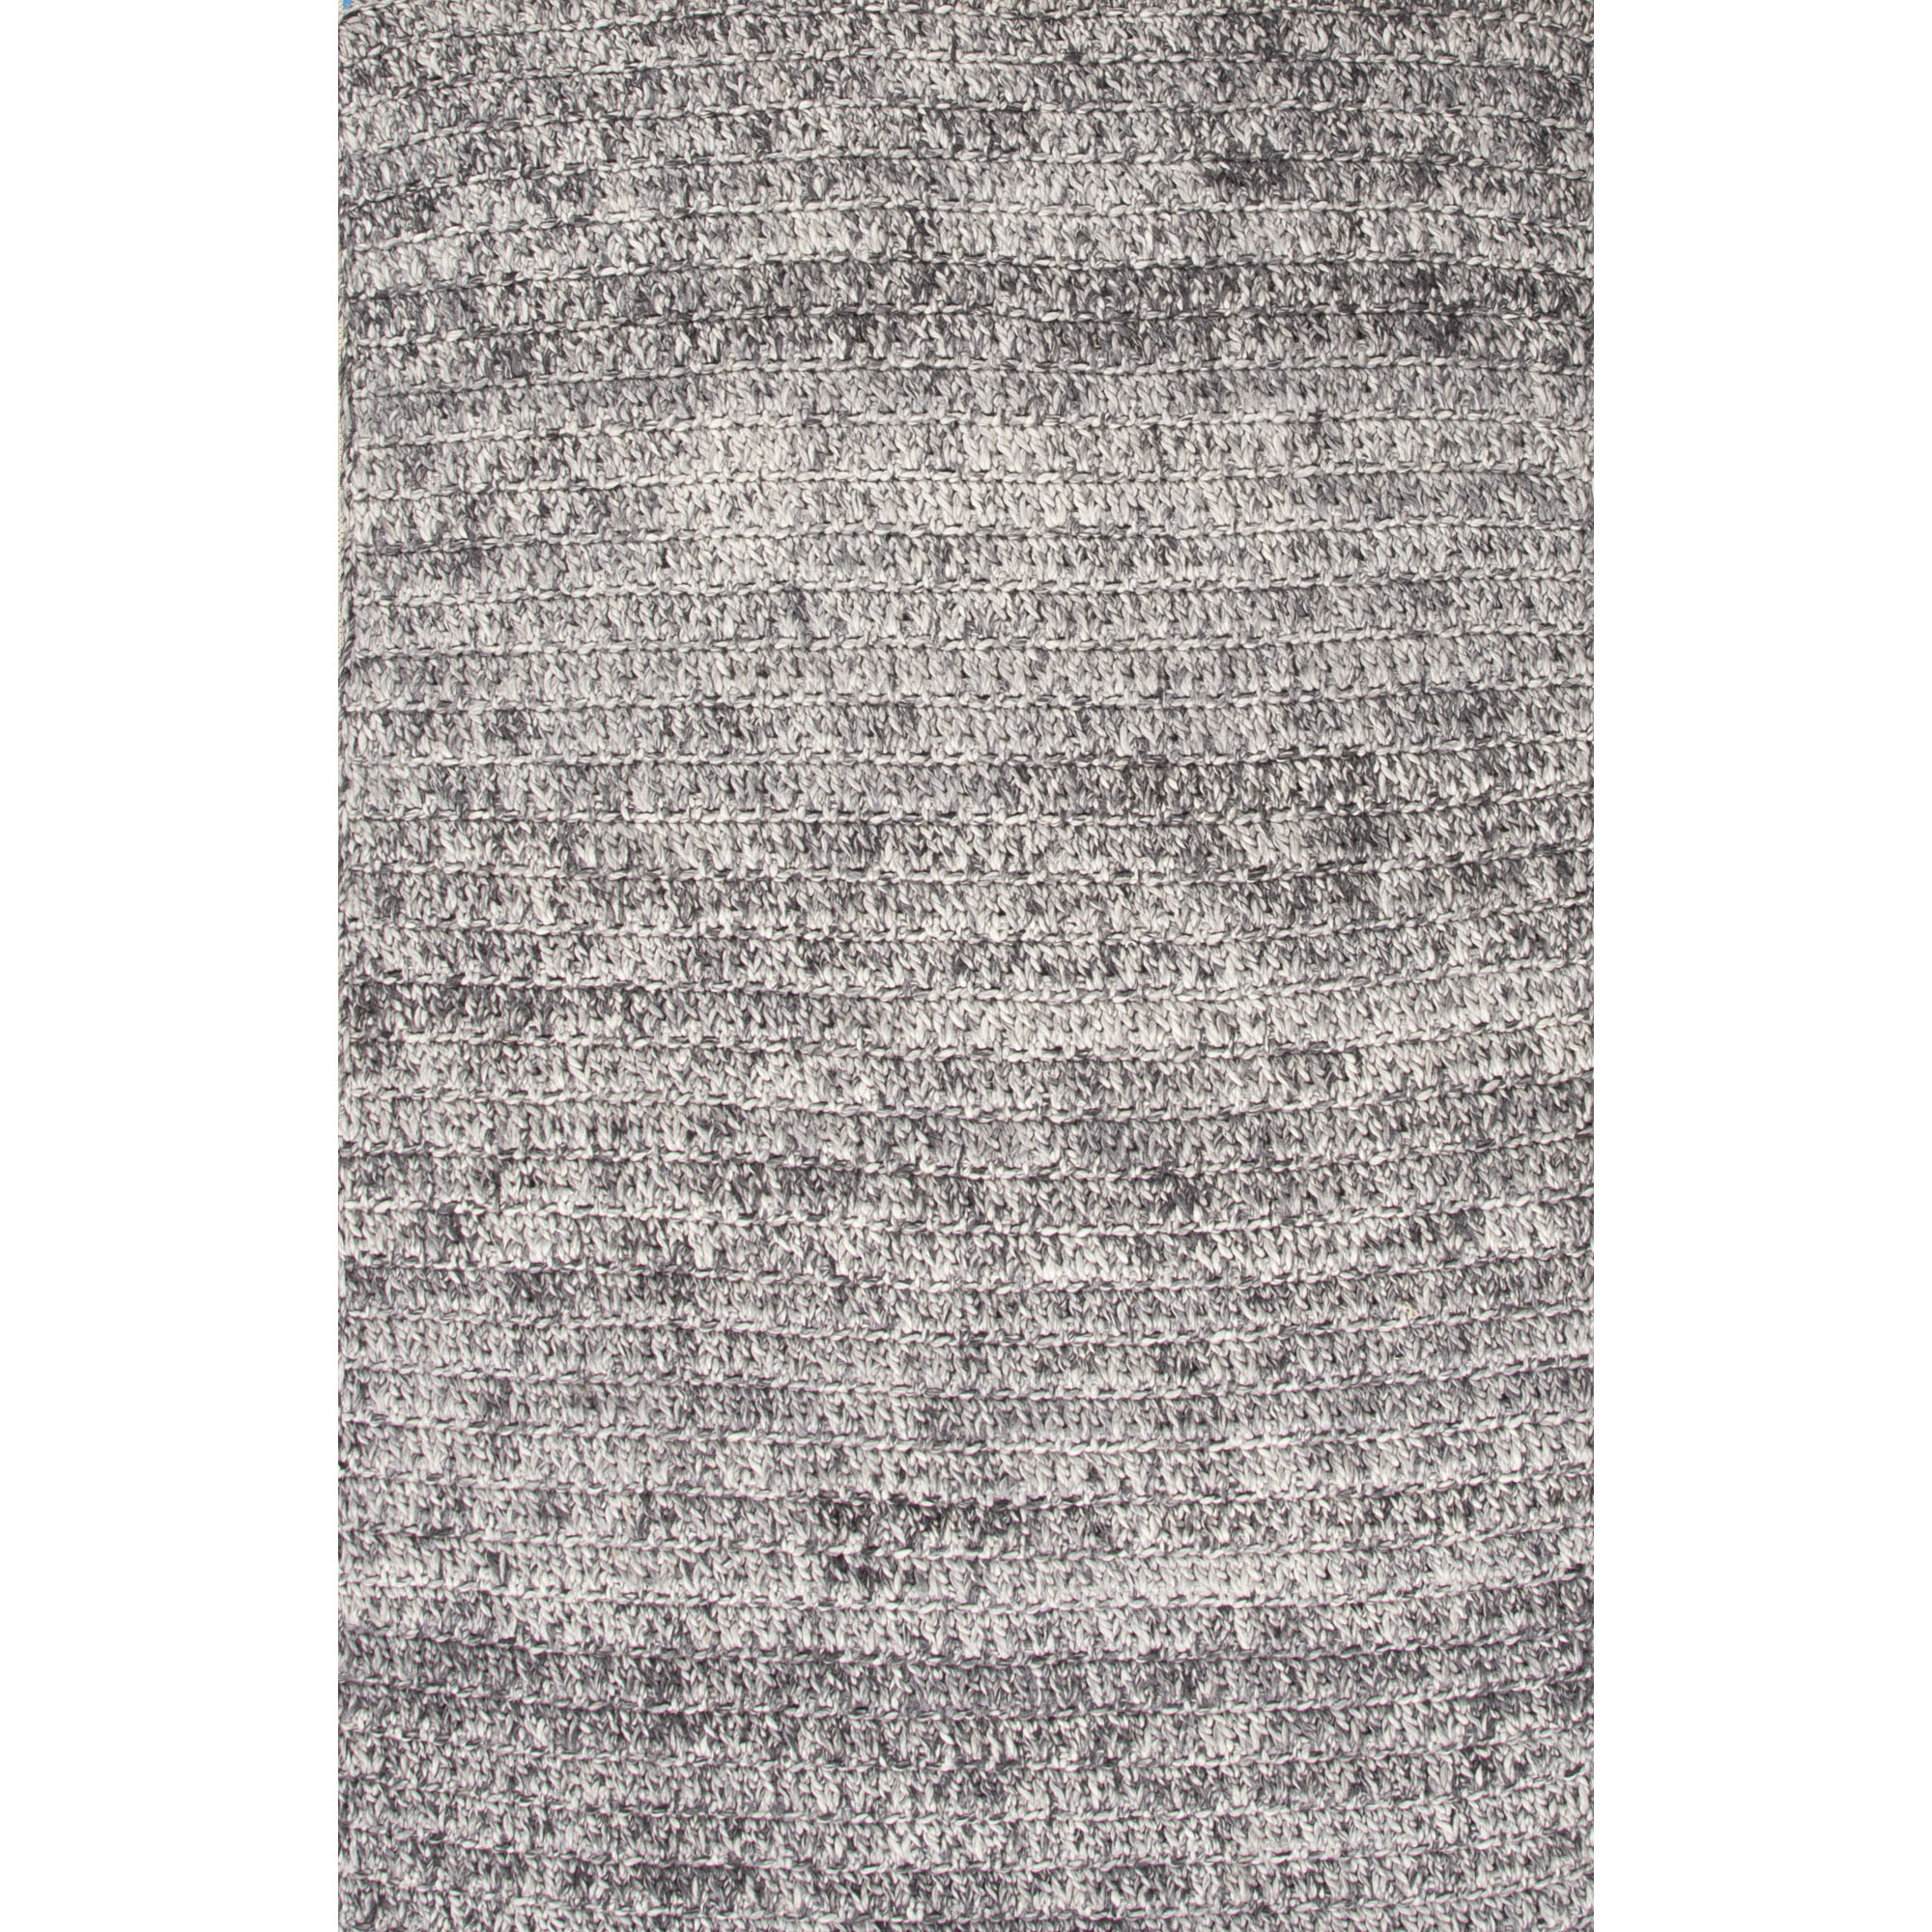 JAIPUR Rugs Scandinavia Dula 2 x 3 Rug - Item Number: RUG113091